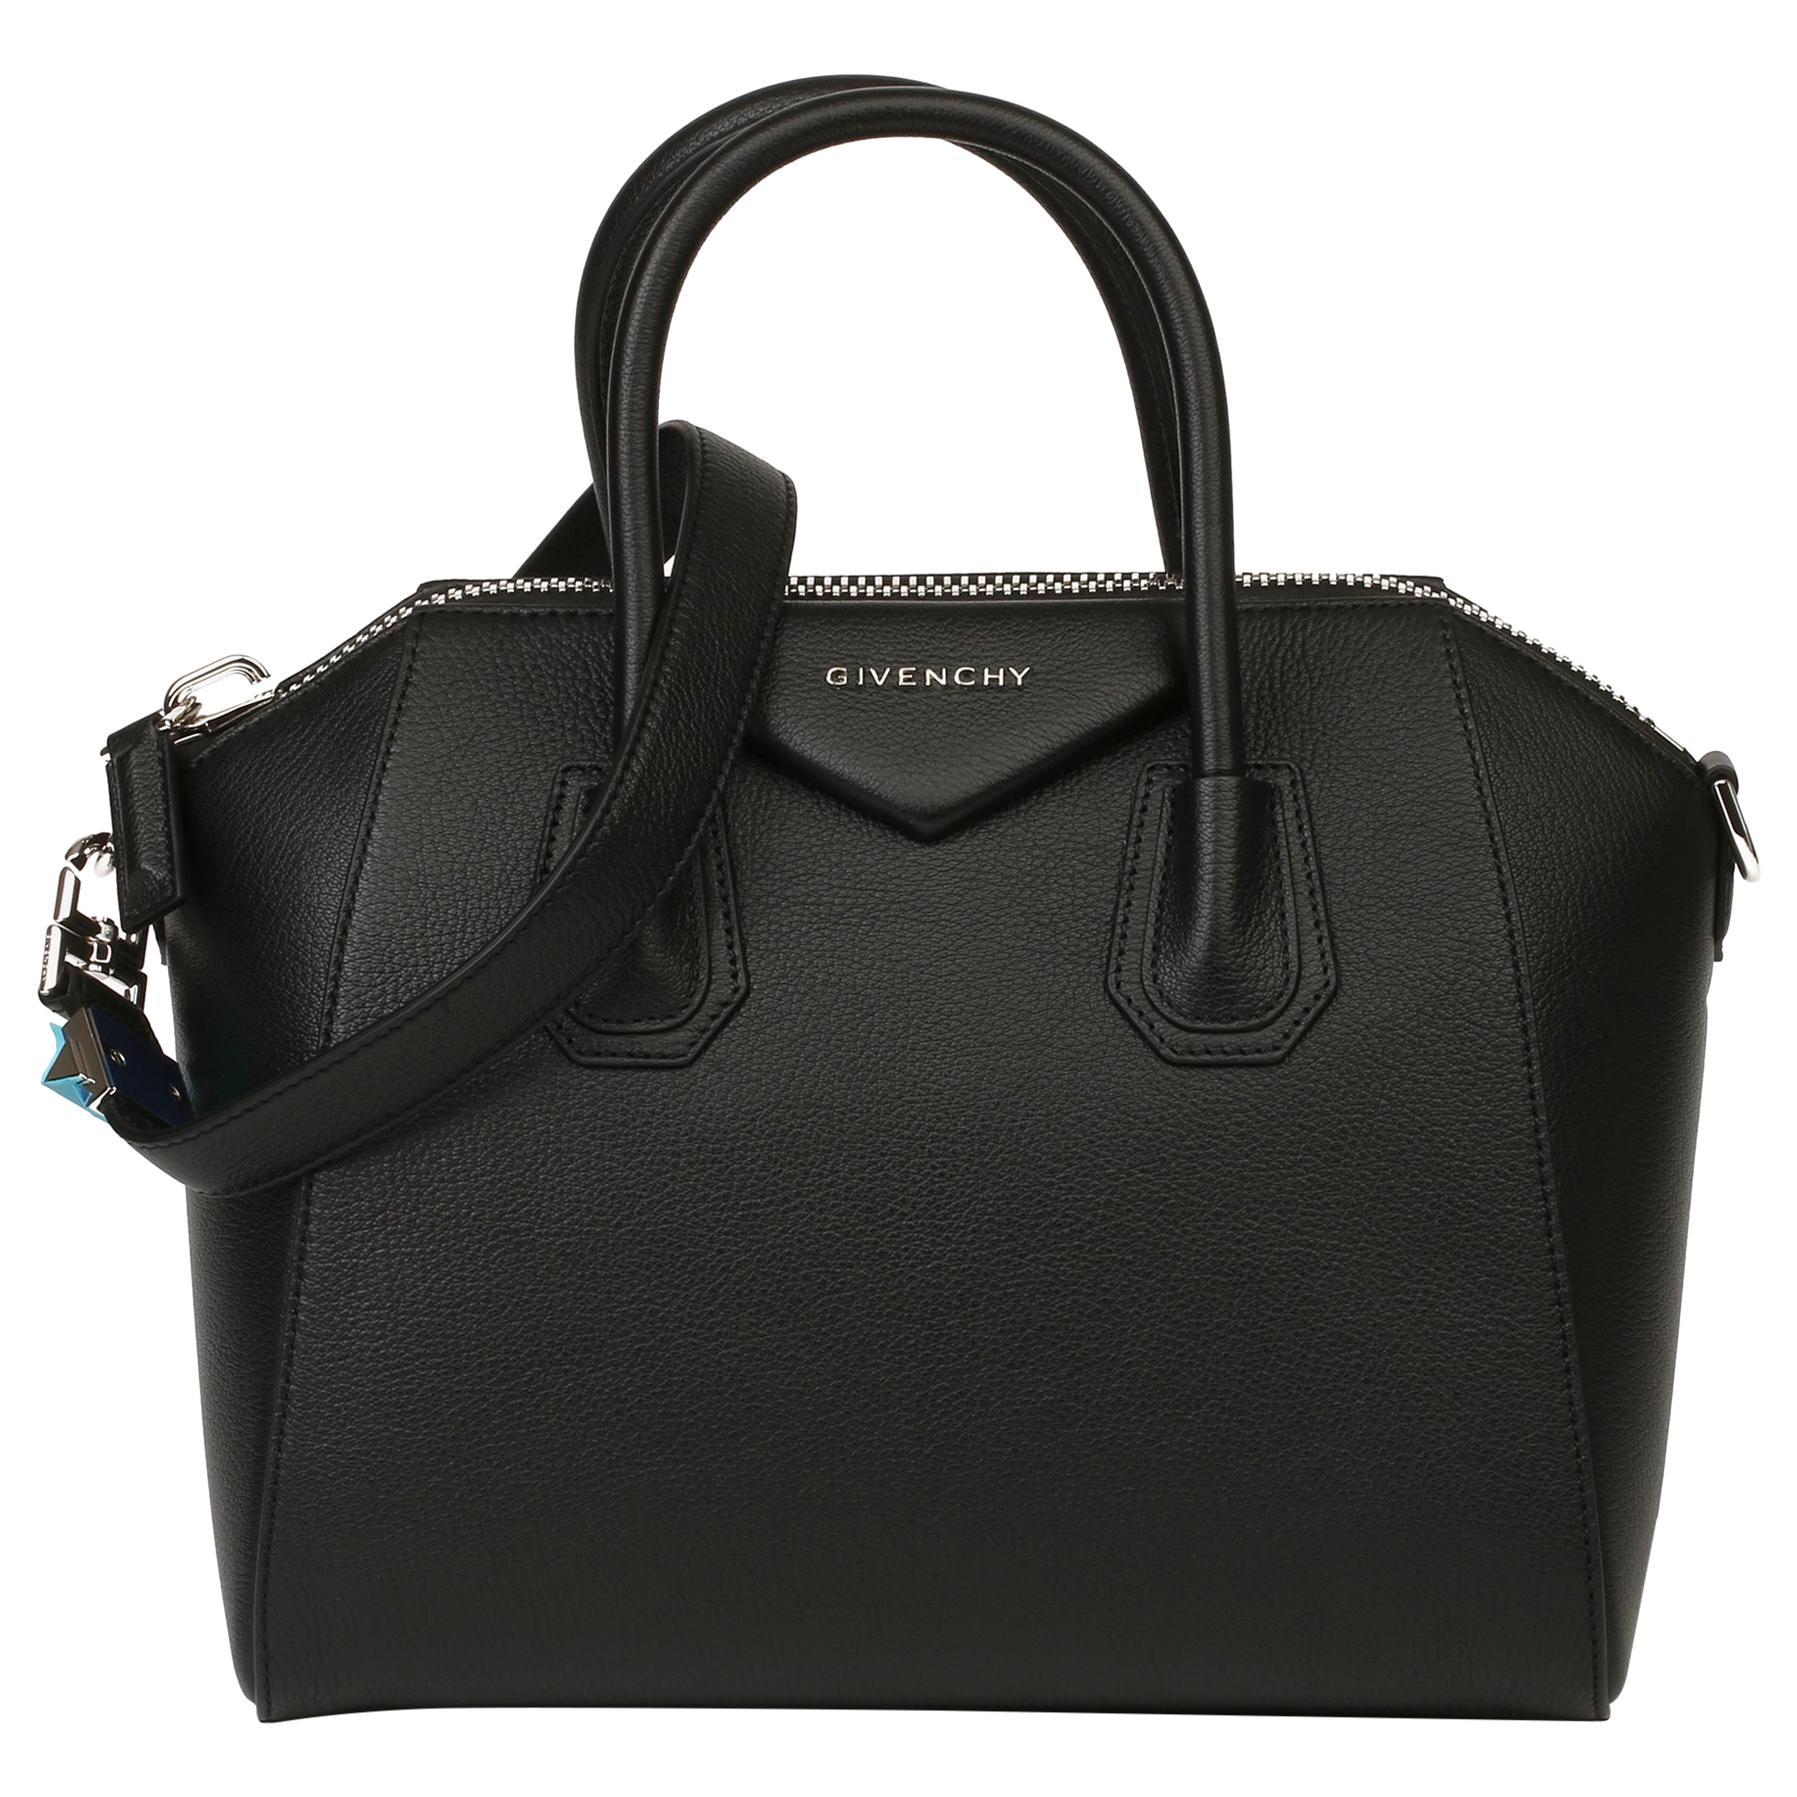 2020 Givenchy Black Goatskin Leather Small Antigona